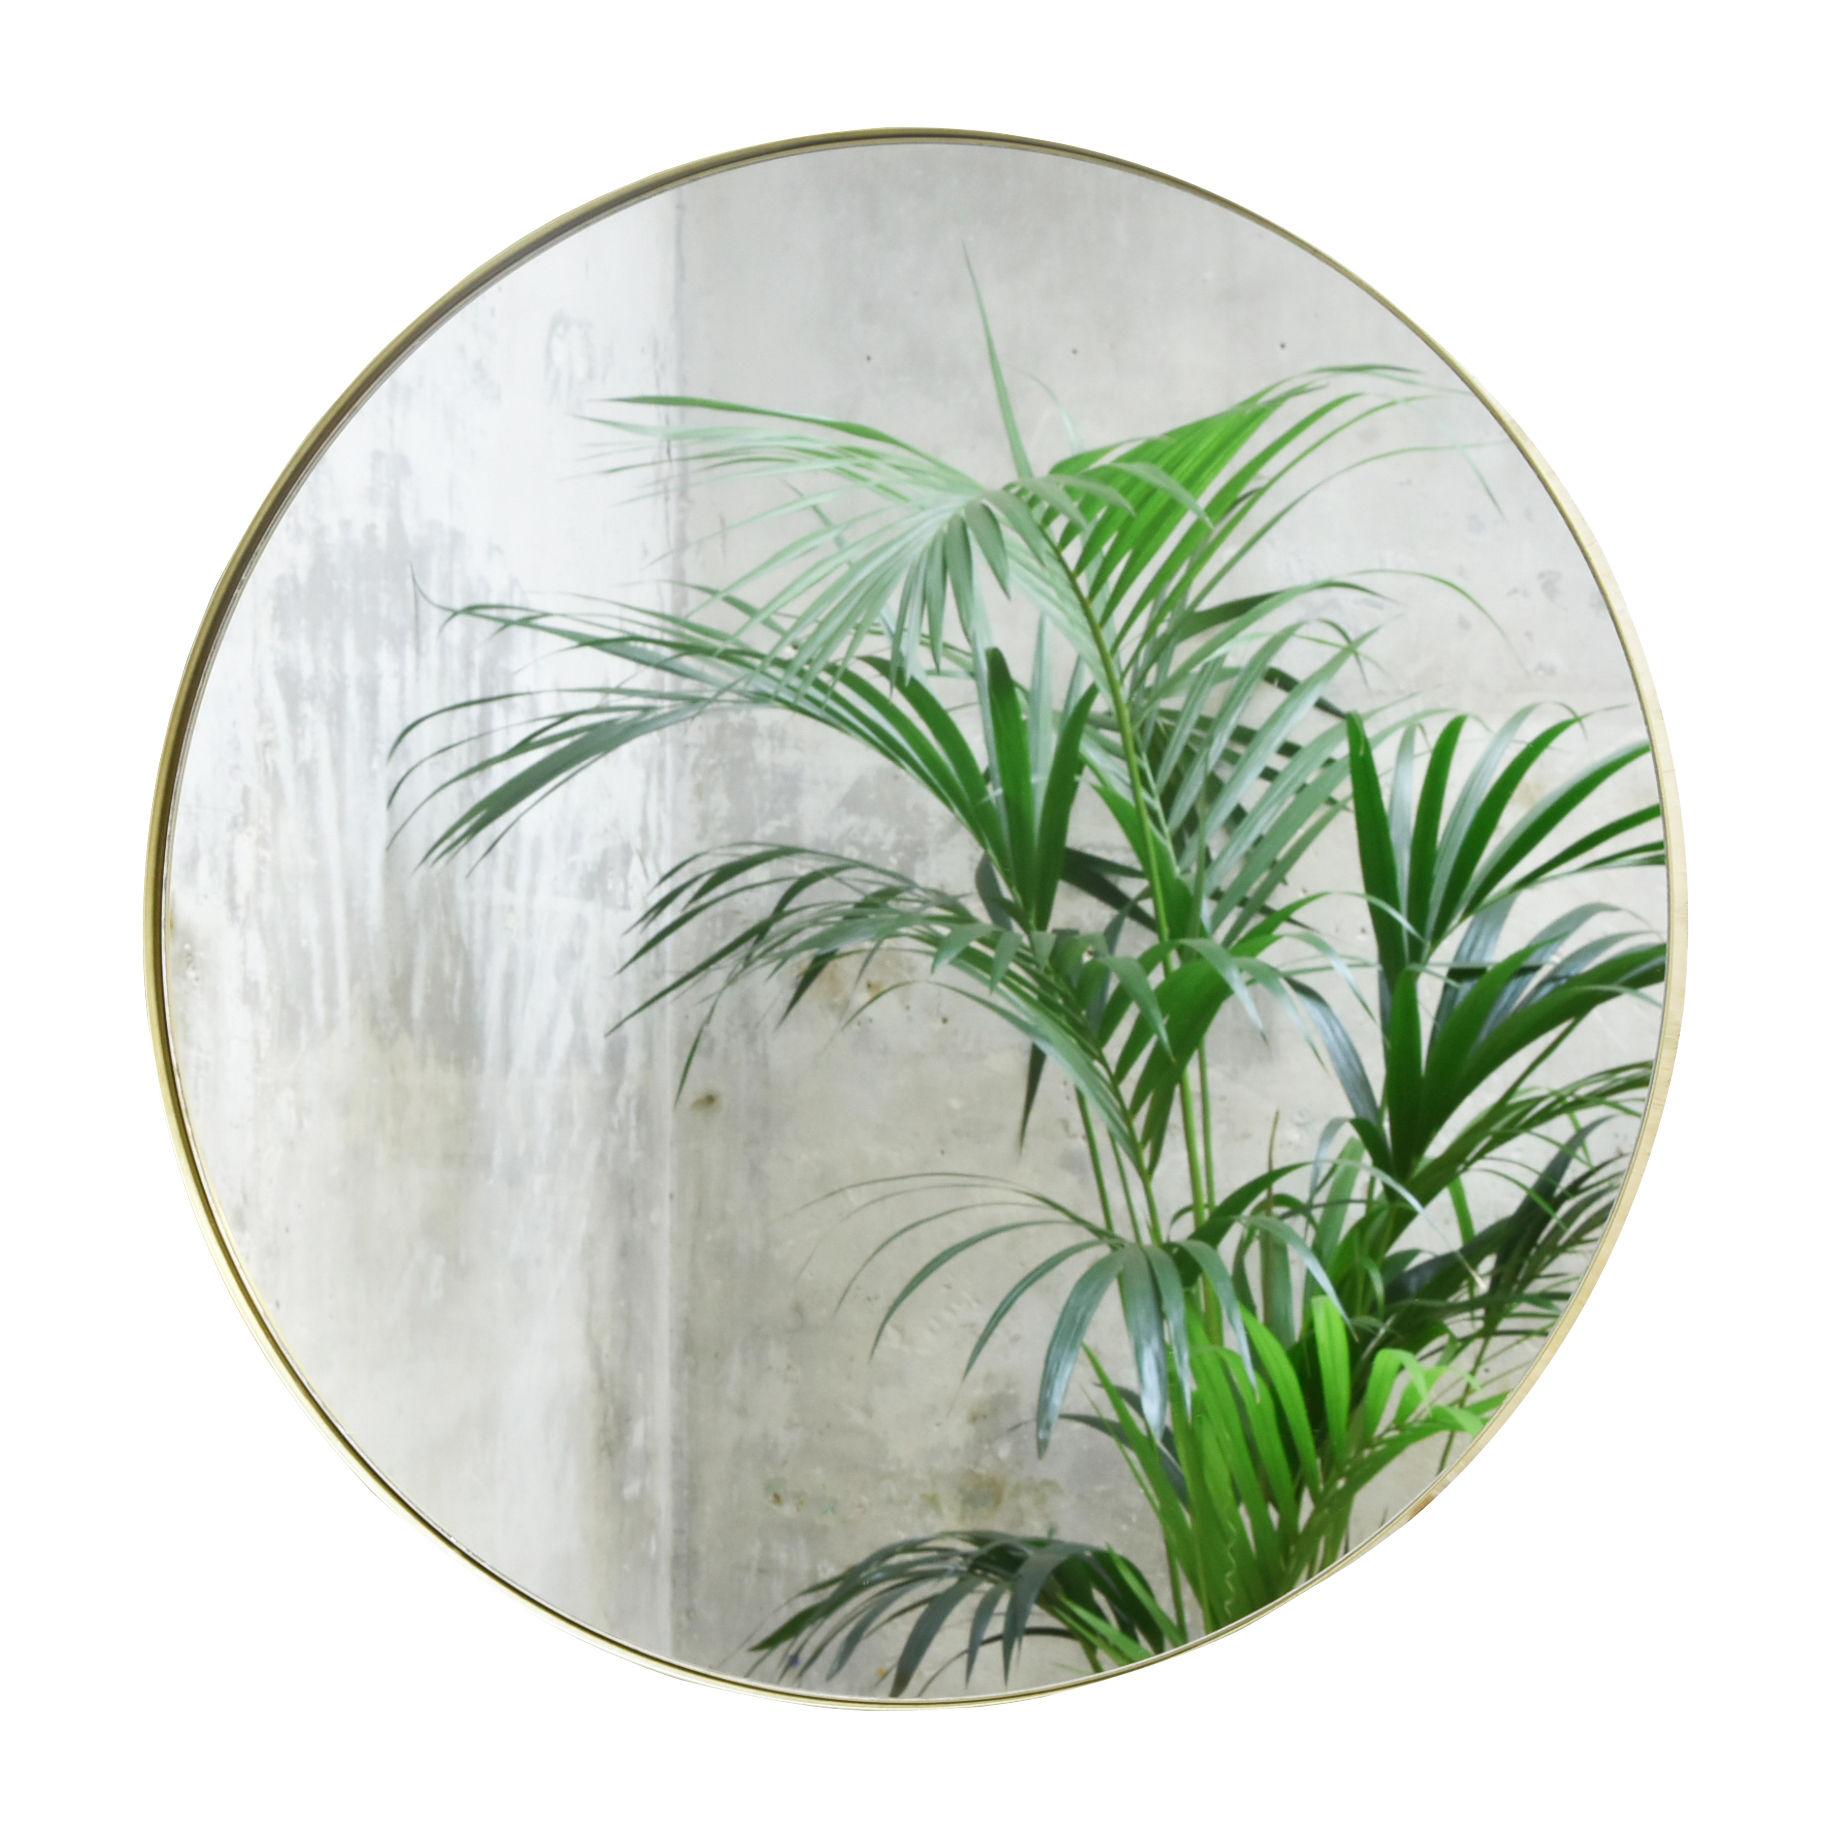 Decoration - Mirrors - Cruziana Rond Wall mirror - / Ø 47 cm by ENOstudio - Brass - Glass, Steel